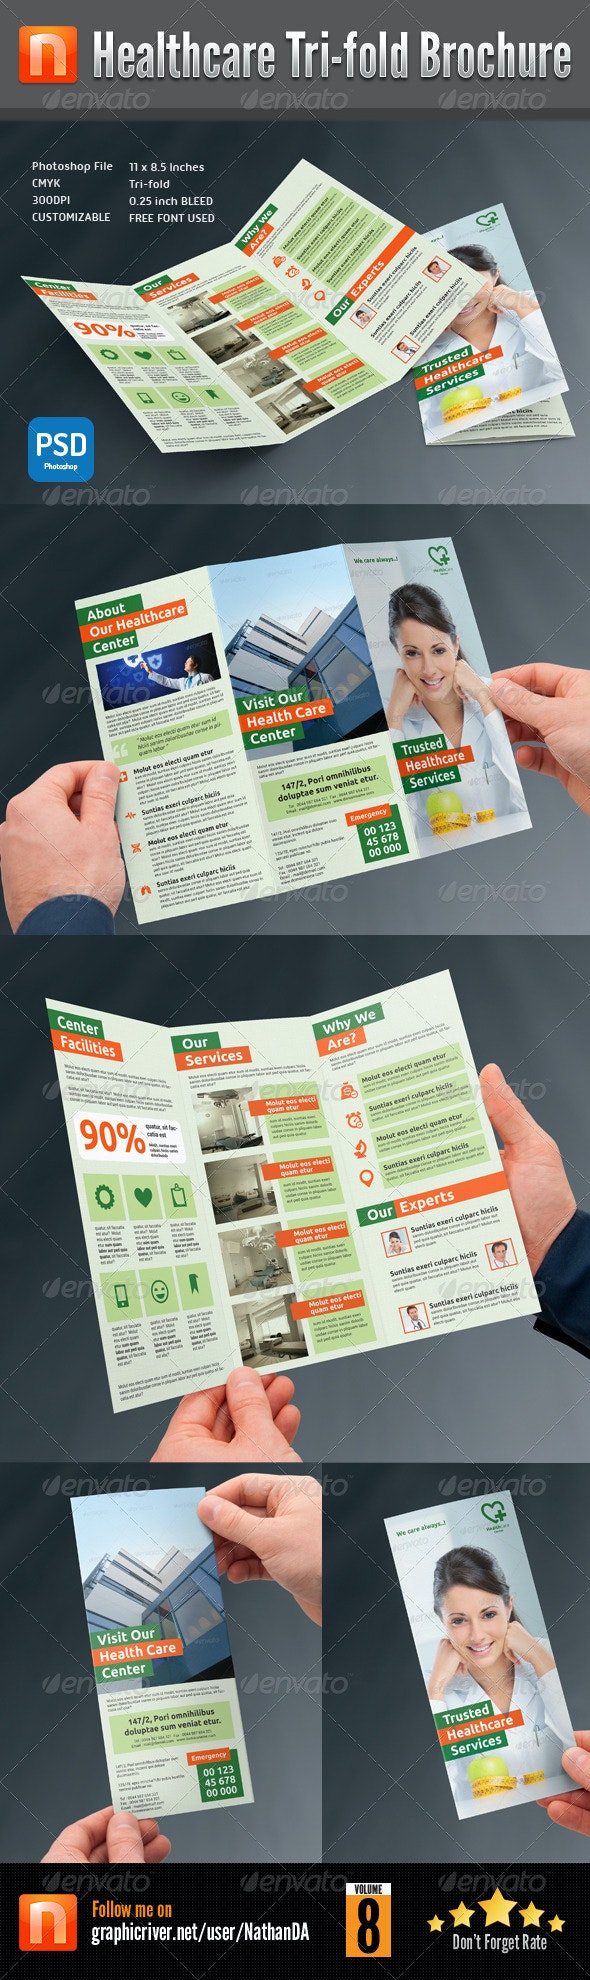 Healthcare Center Tri-fold Brochure V8 - Corporate Brochures